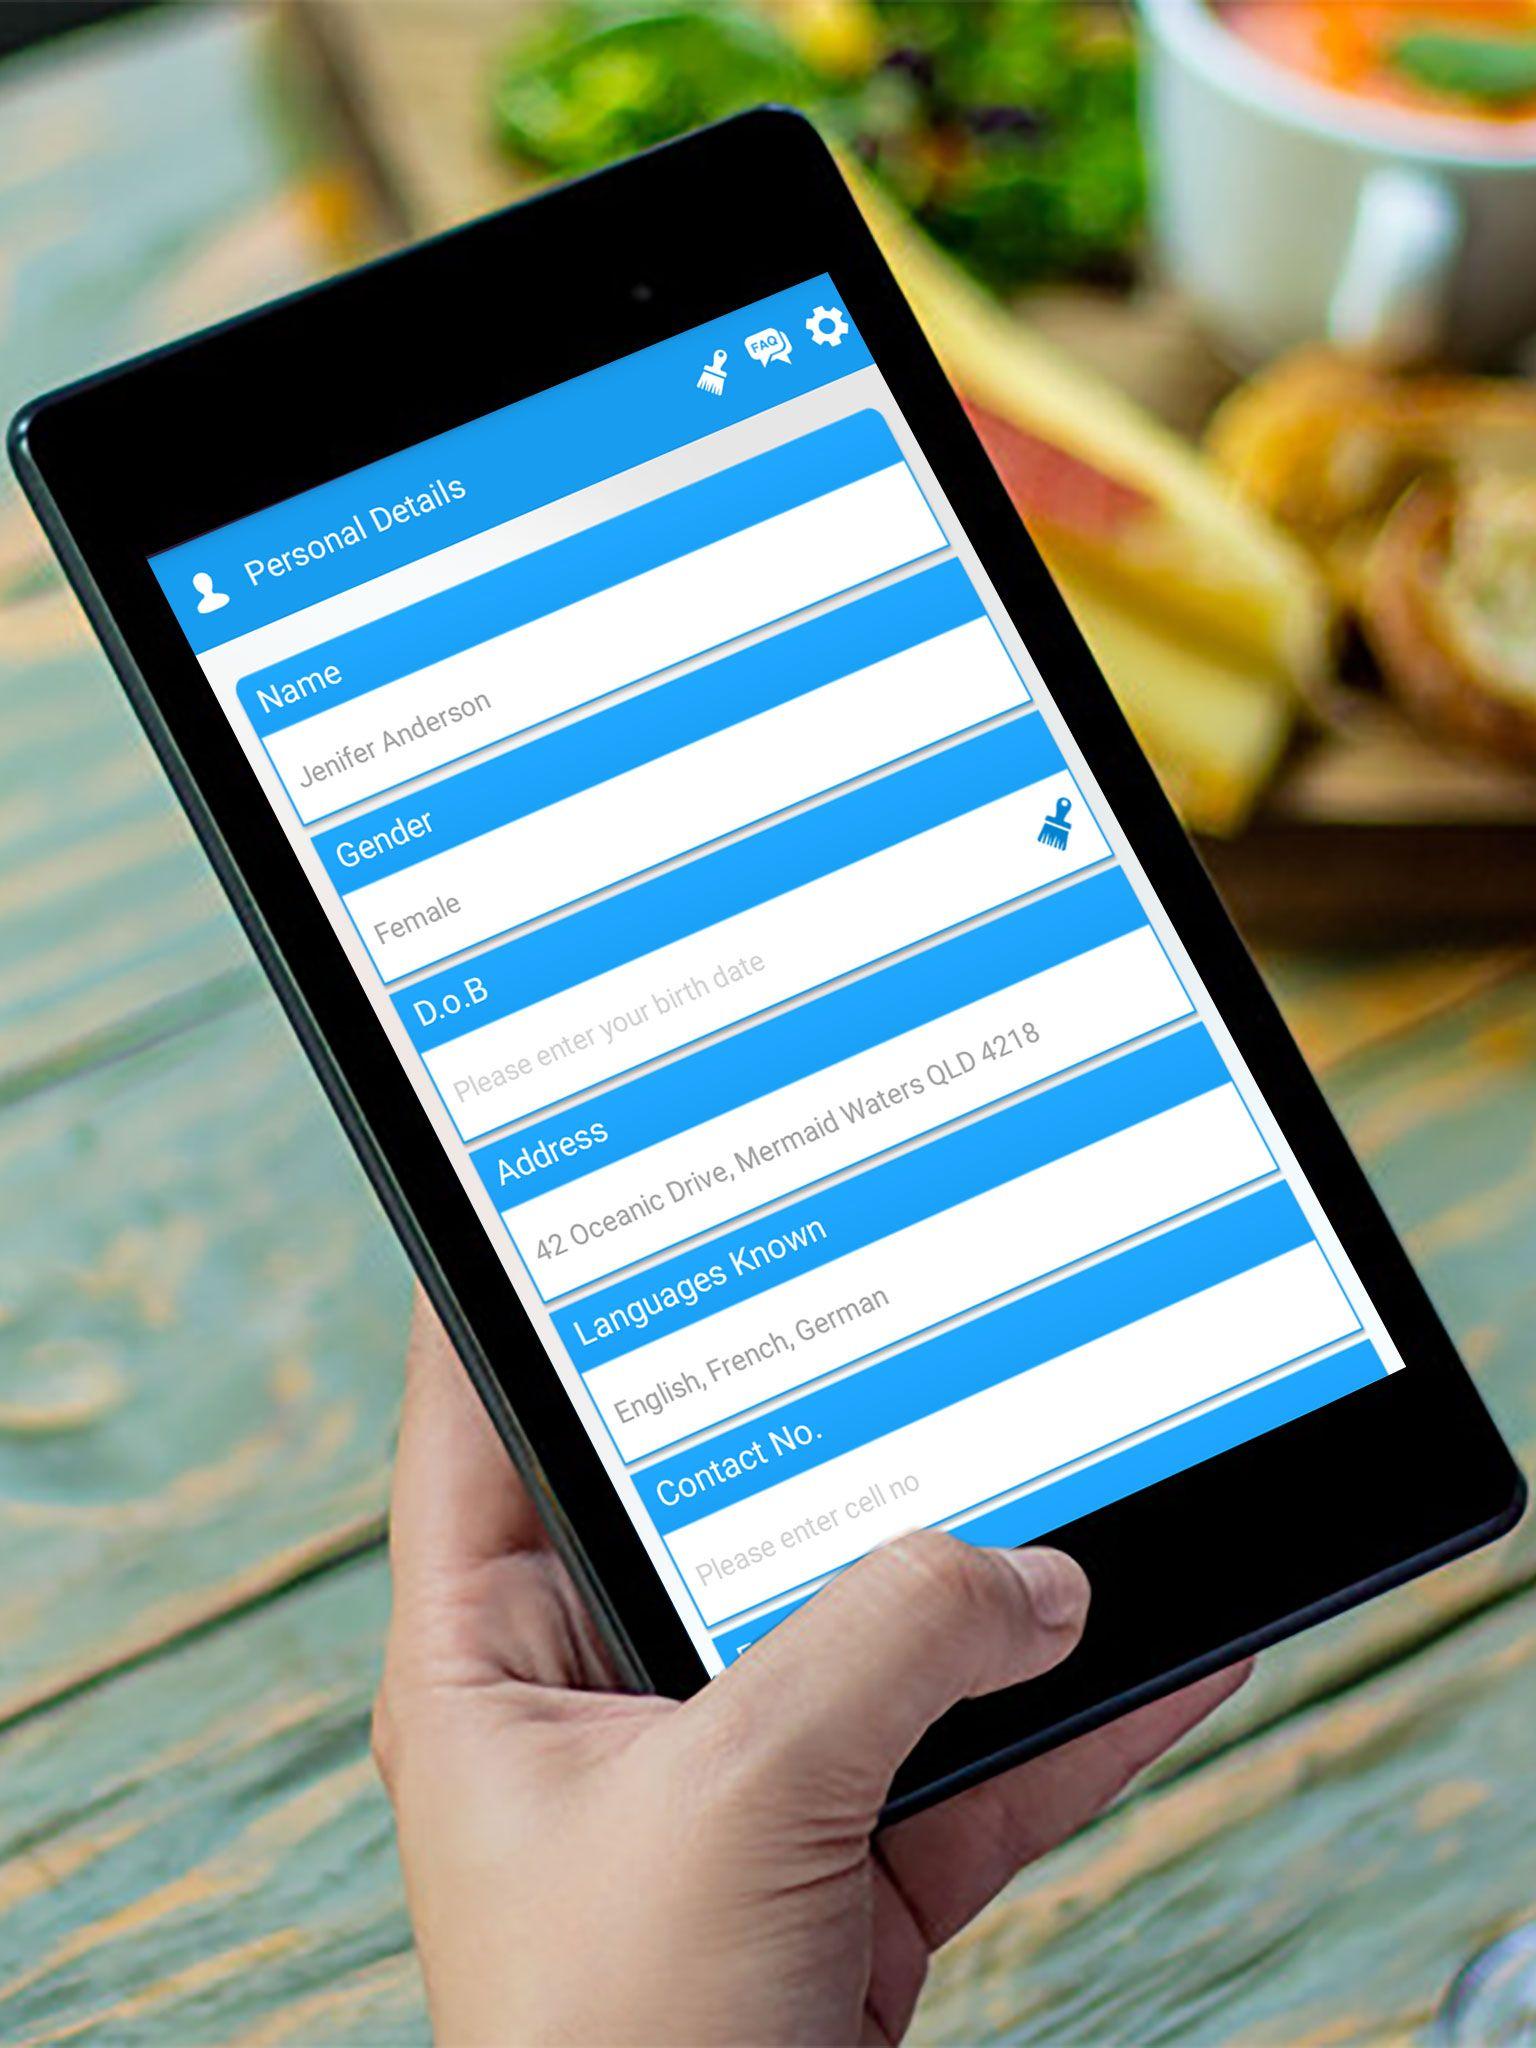 Resume Maker Admob and Facebook Integration in 2020